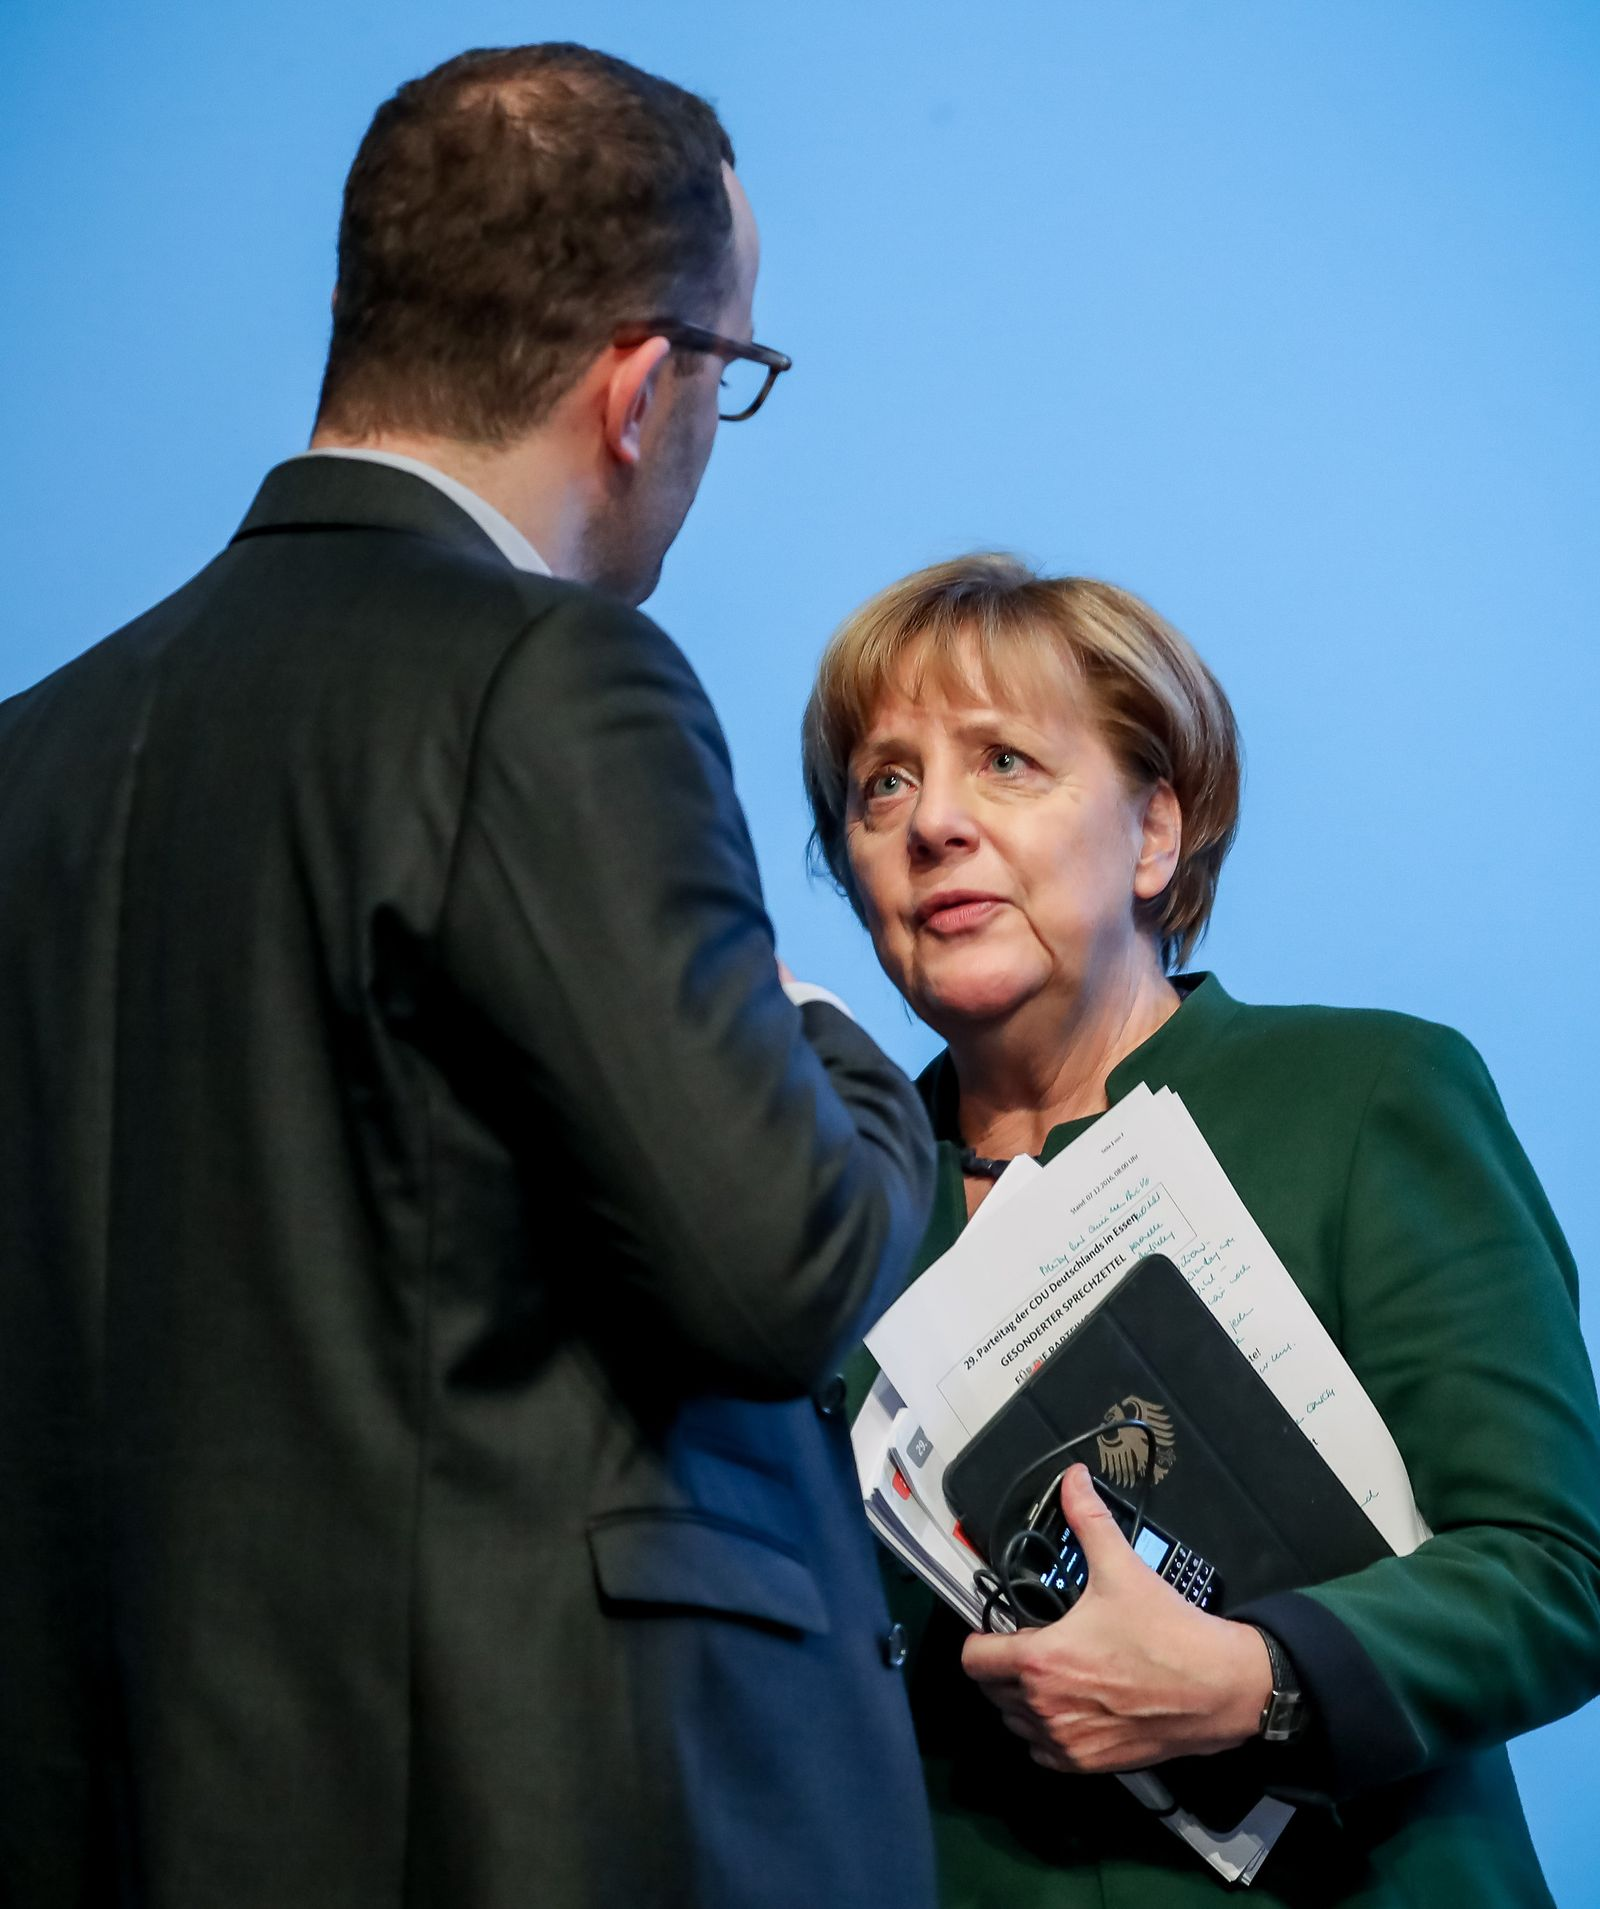 CDU-Bundesparteitag / Angela Merkel / Jens Spahn